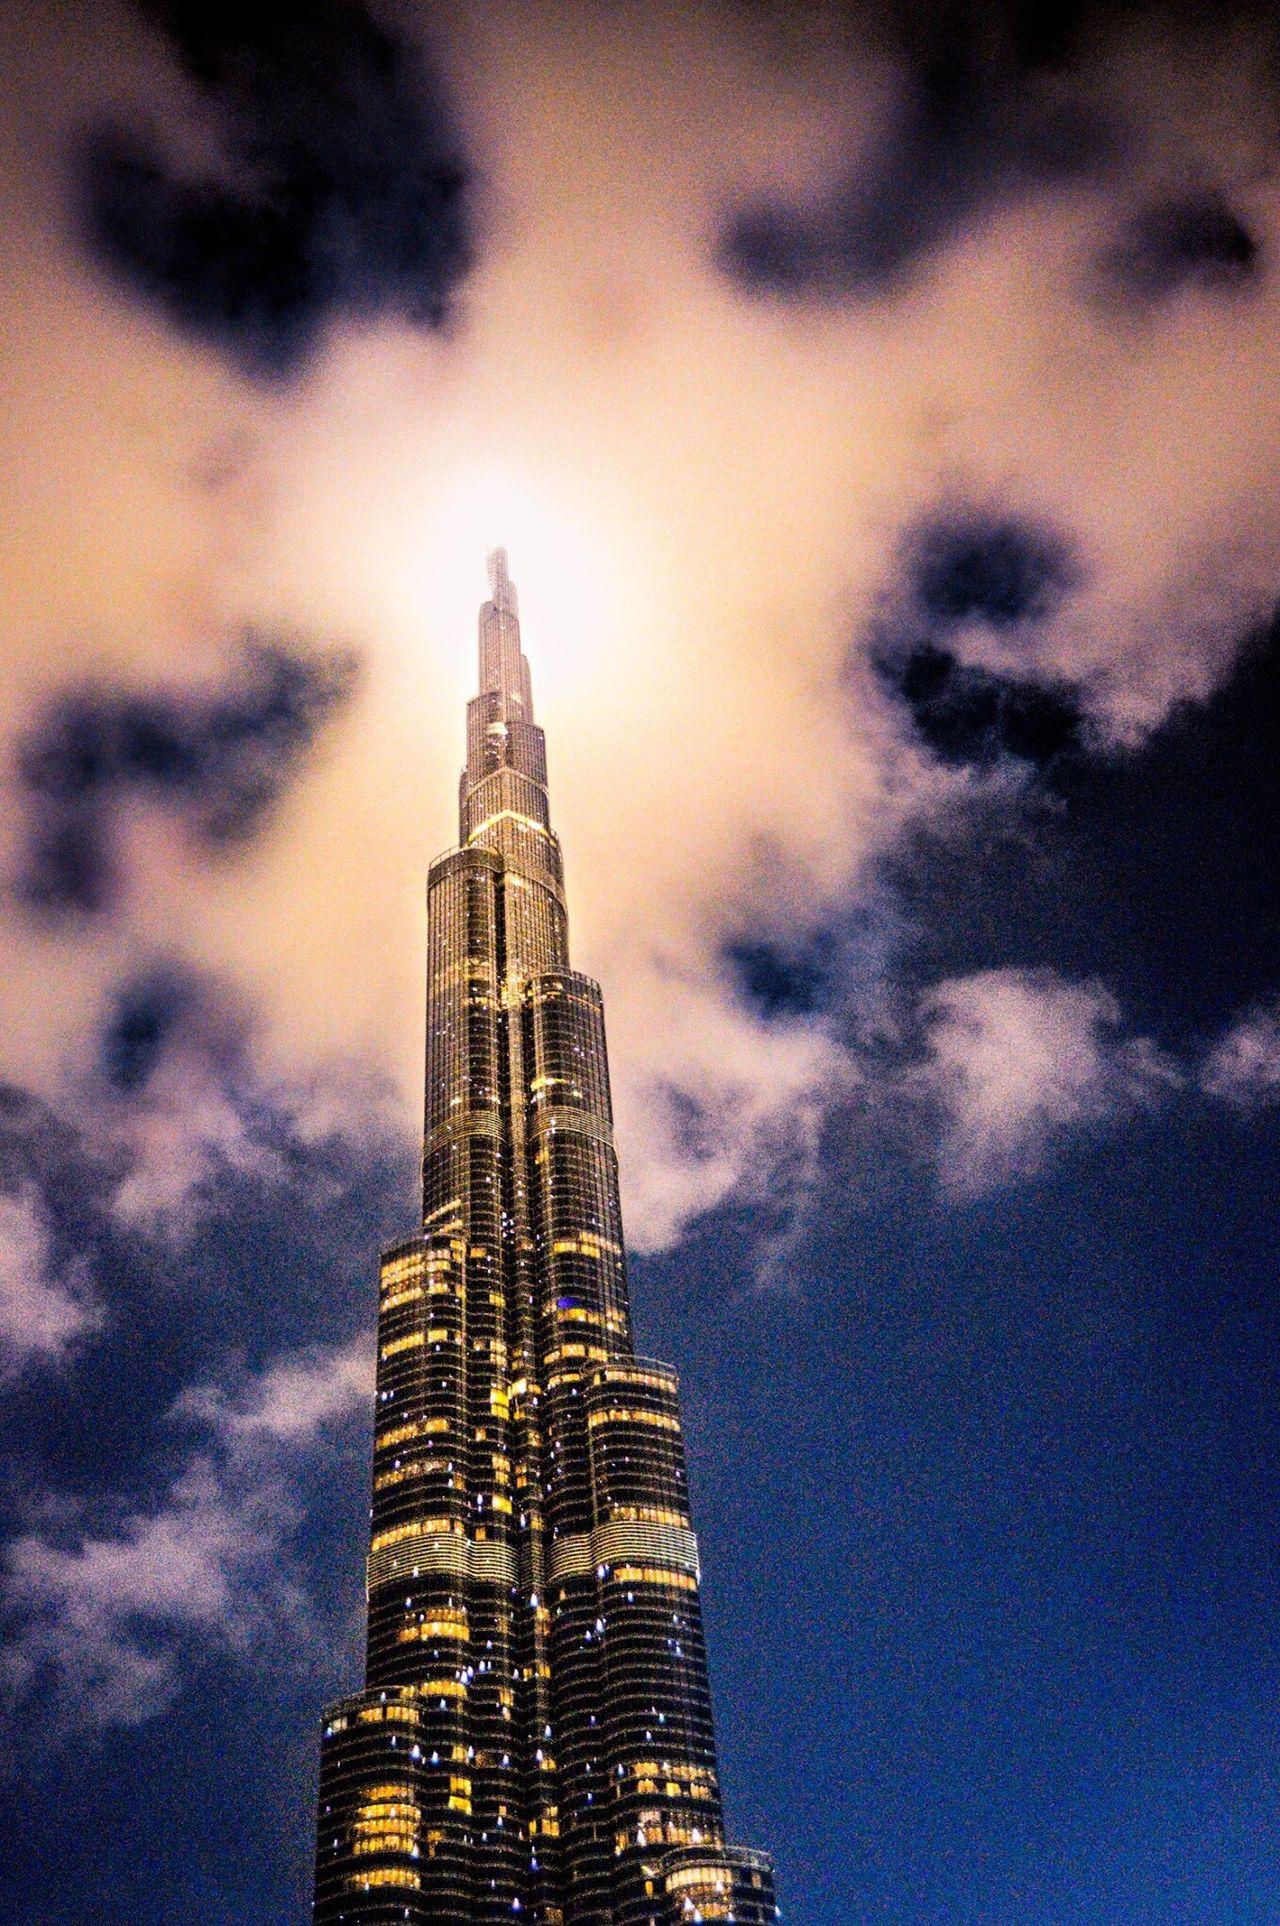 When the Burj Khalifa met the sky!! Check This Out Burj Khalifa Mydubai Dubai Nightphotography Statuesque